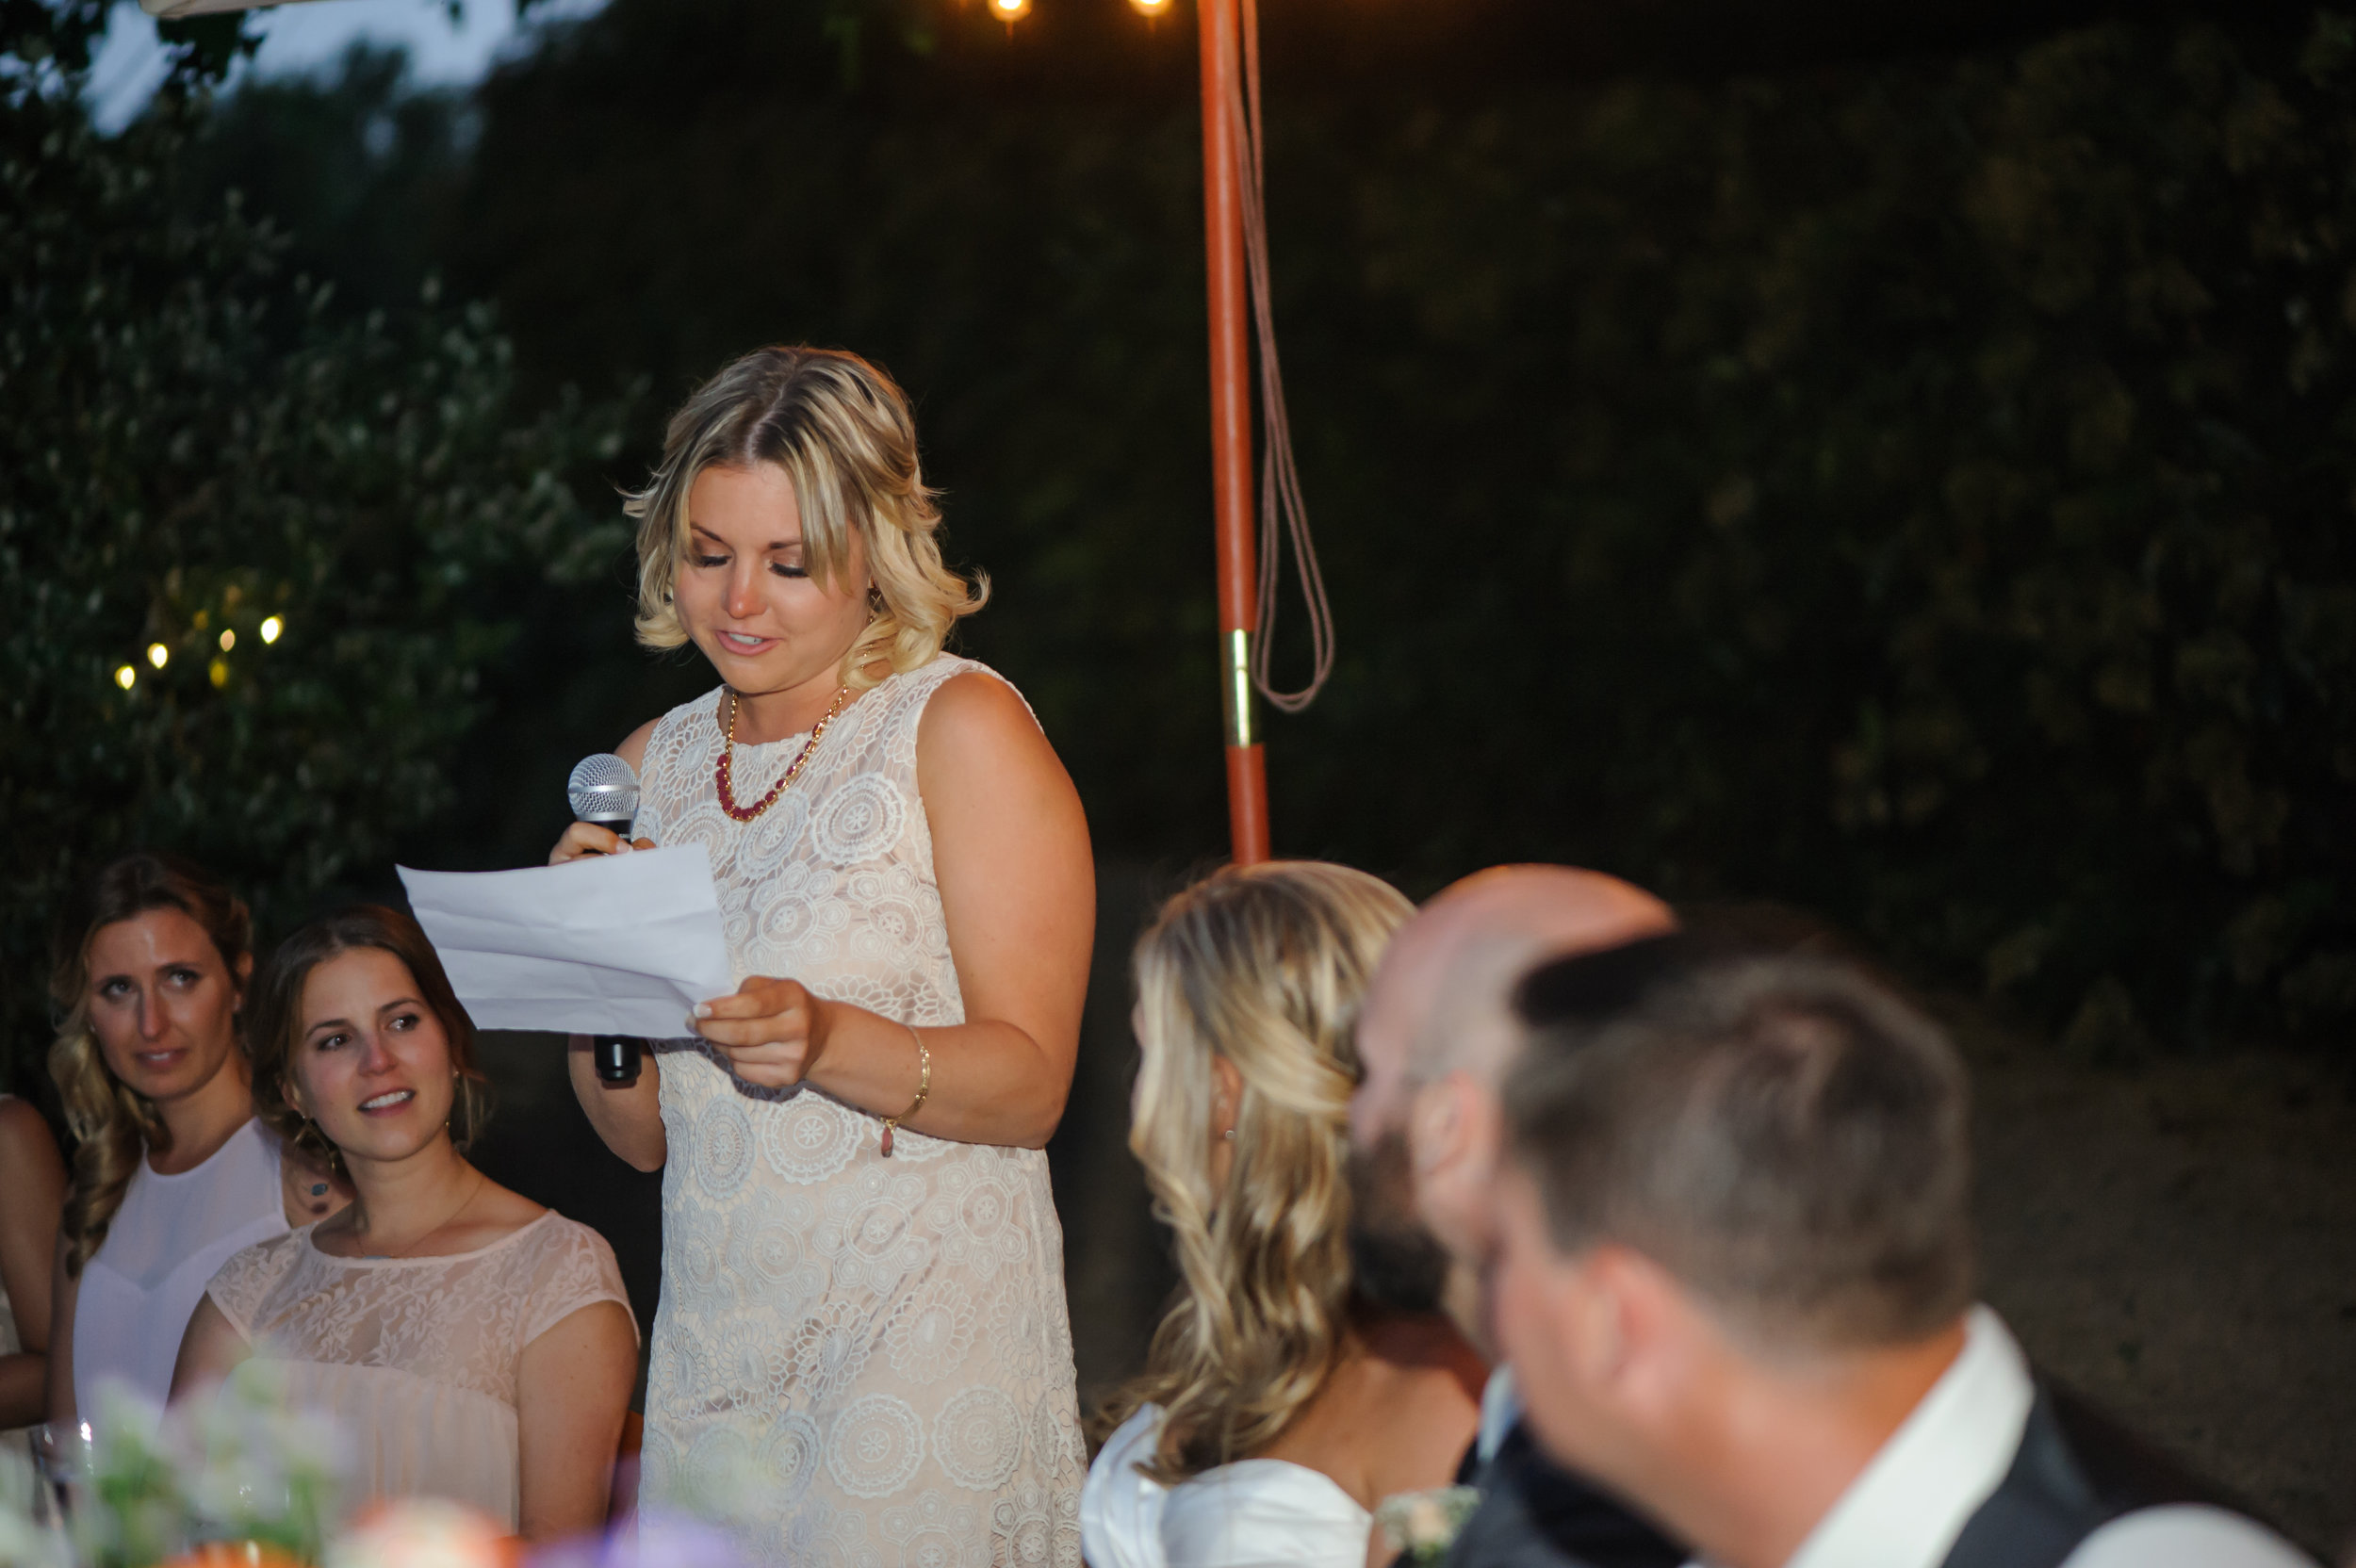 lindsey-alex-029-backyard-sacramento-wedding-photographer-katherine-nicole-photography.JPG